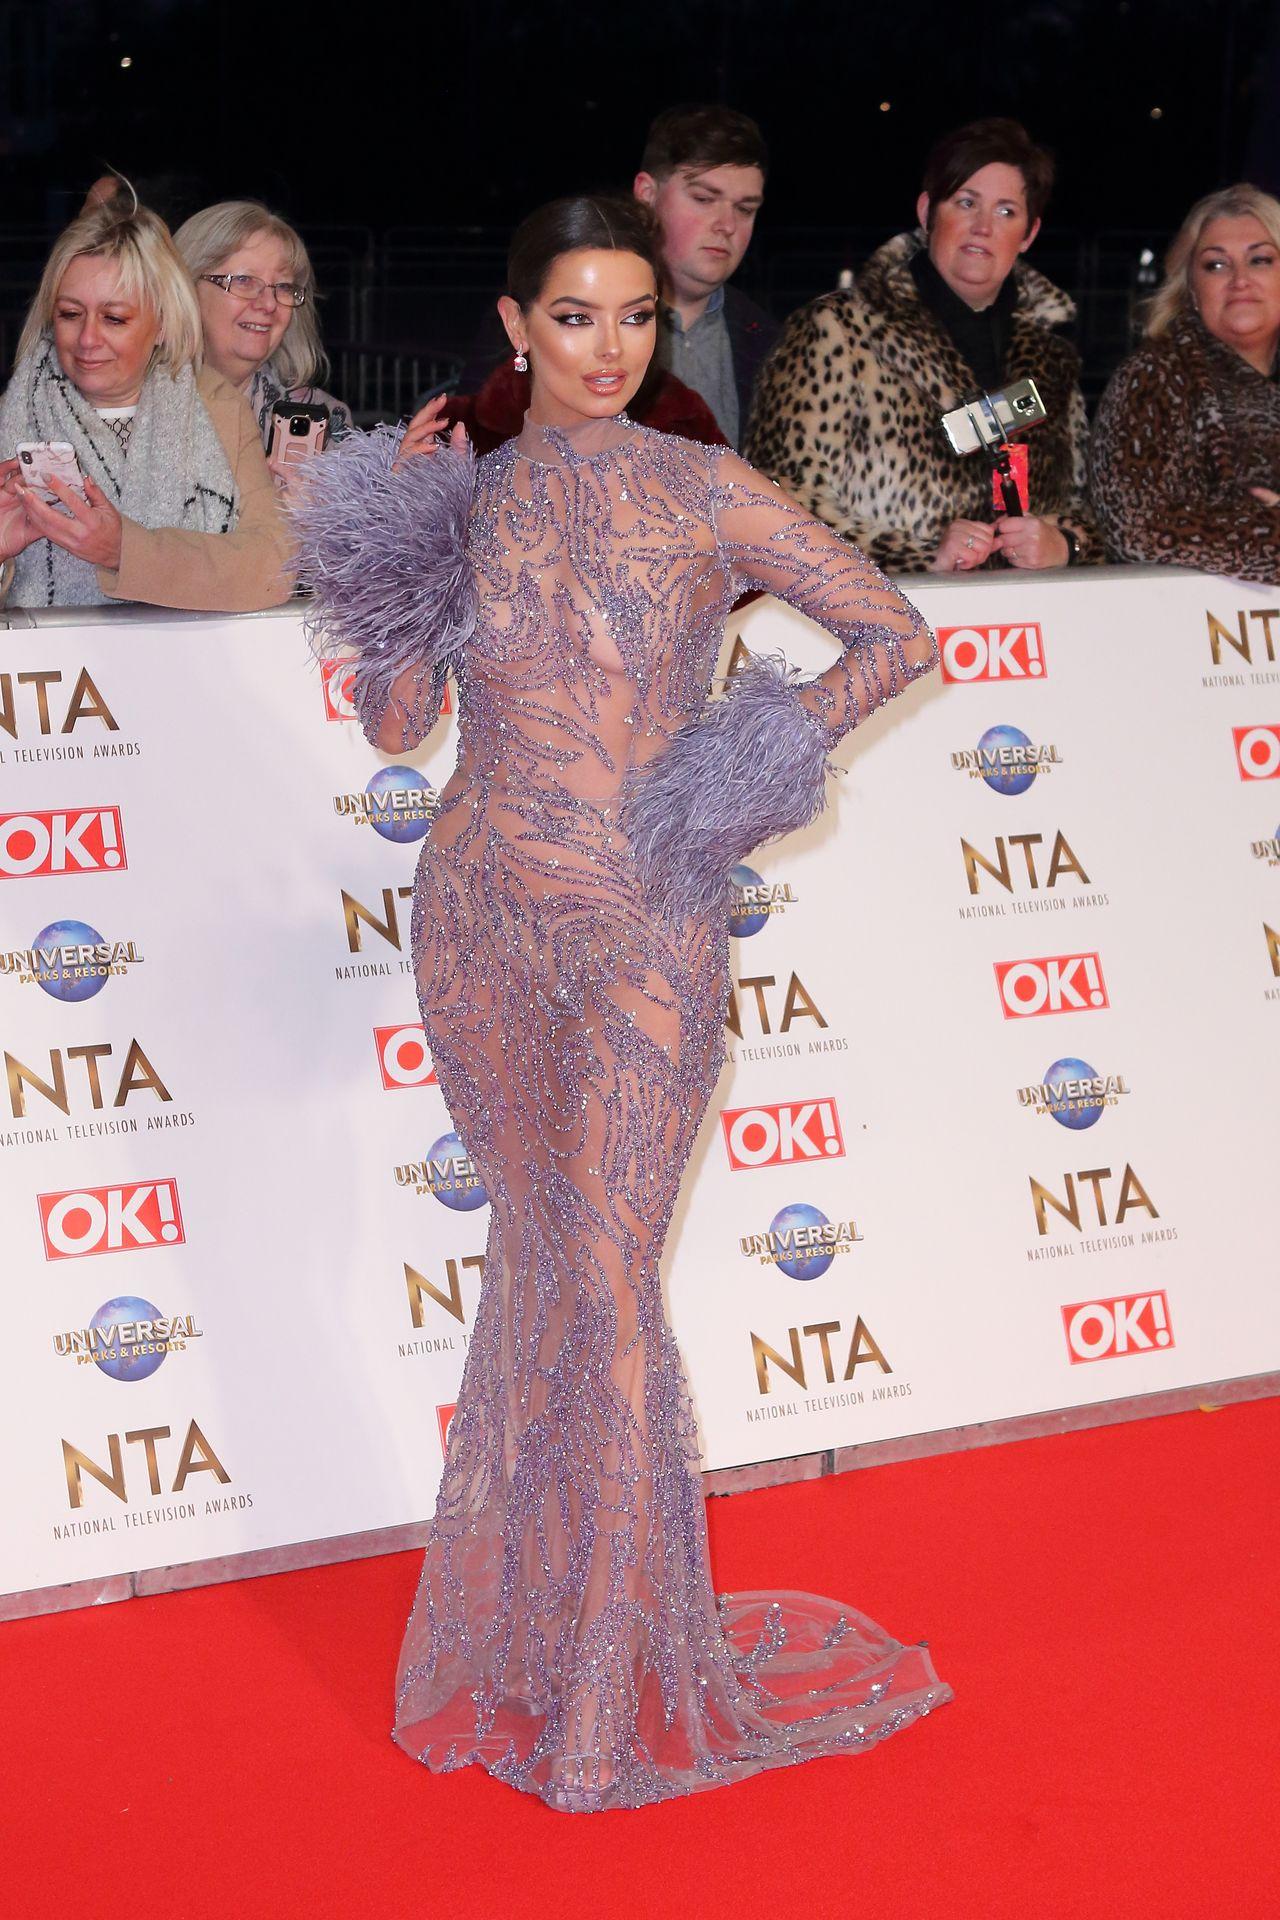 Maura Higgins Looks Hot At The National Television Awards 0011